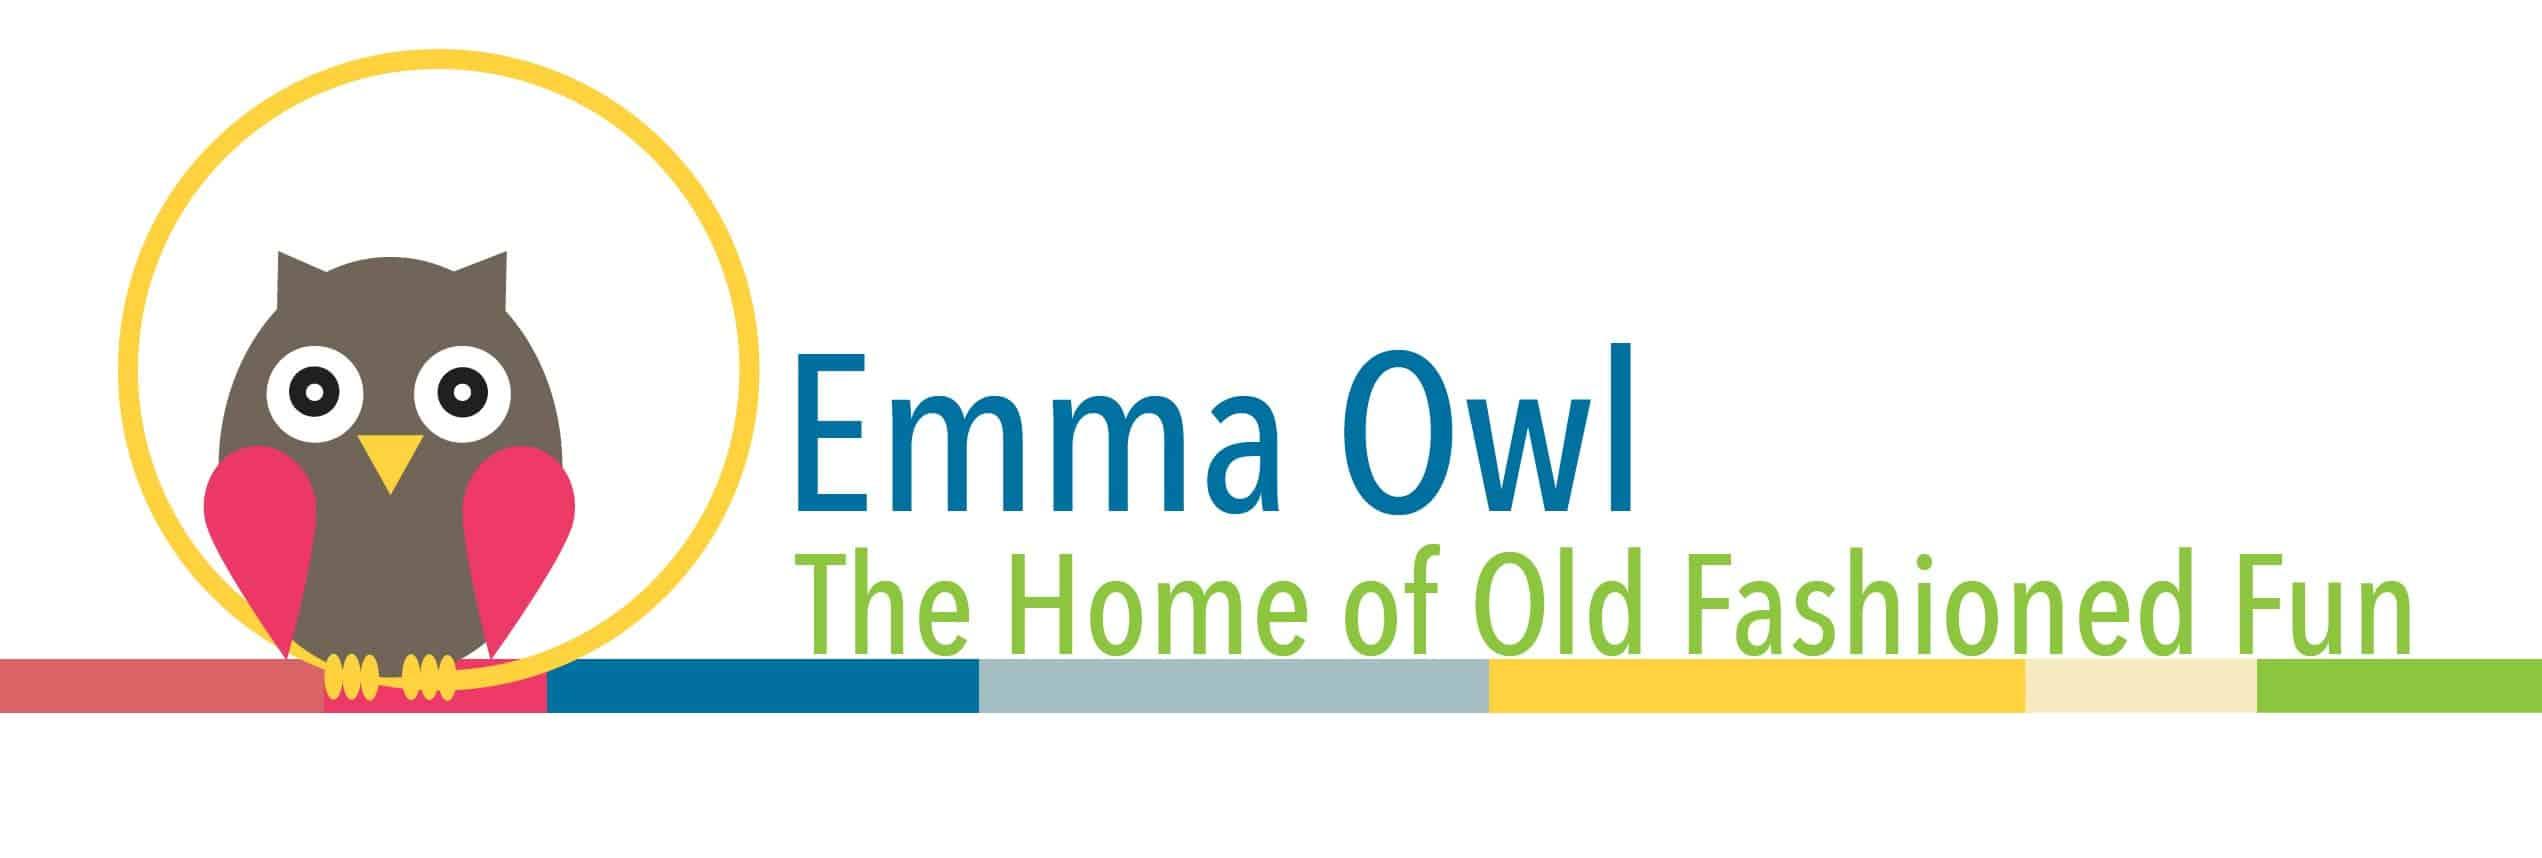 Emma Owl